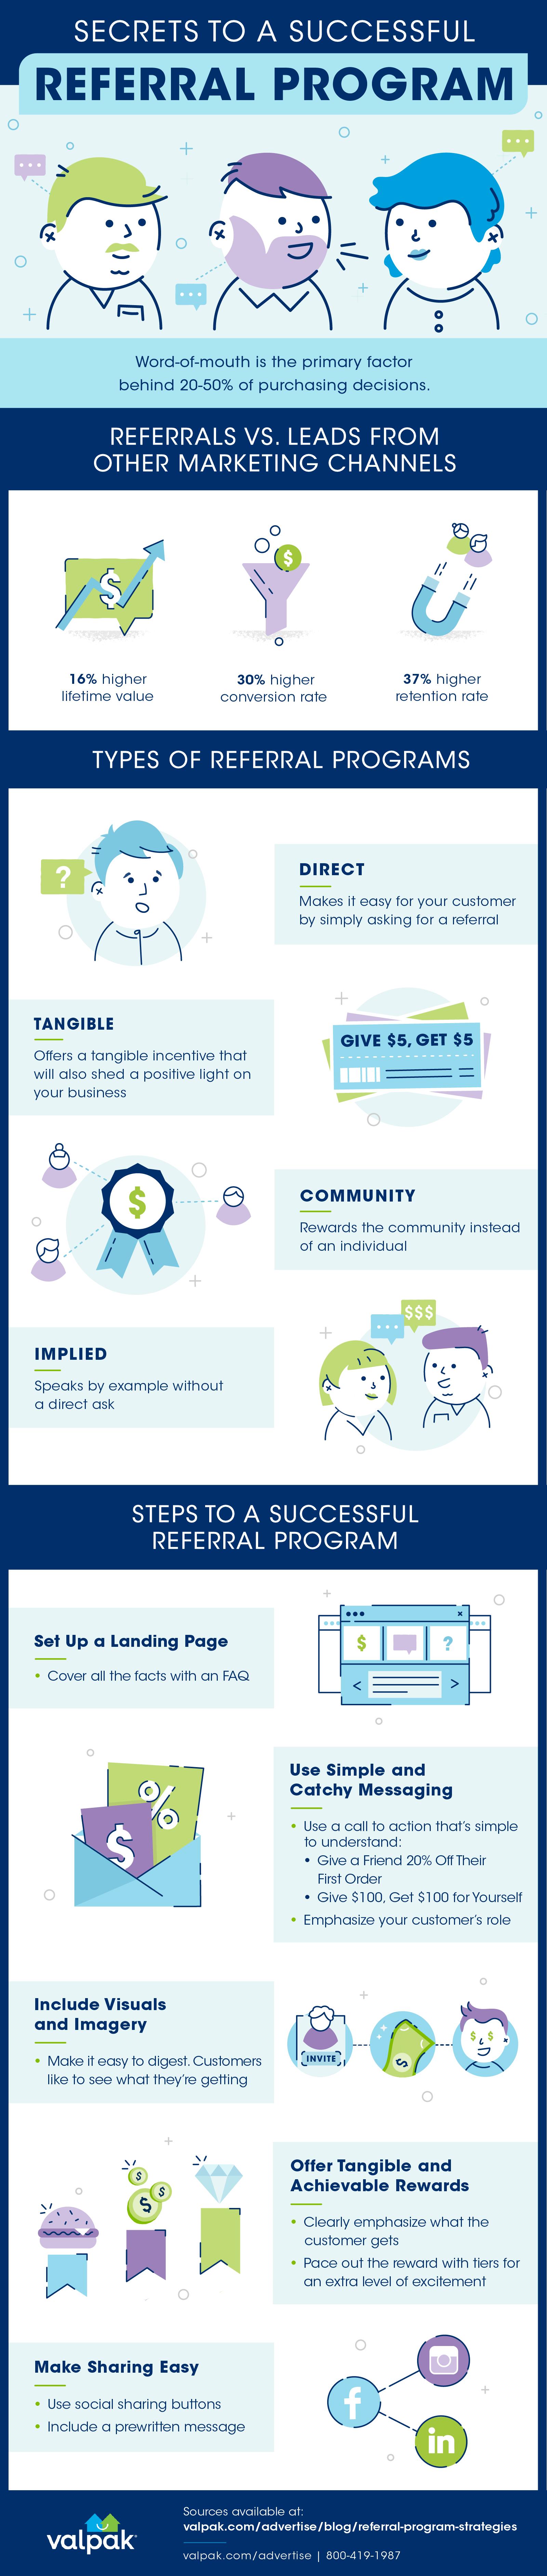 referral program strategies infographic